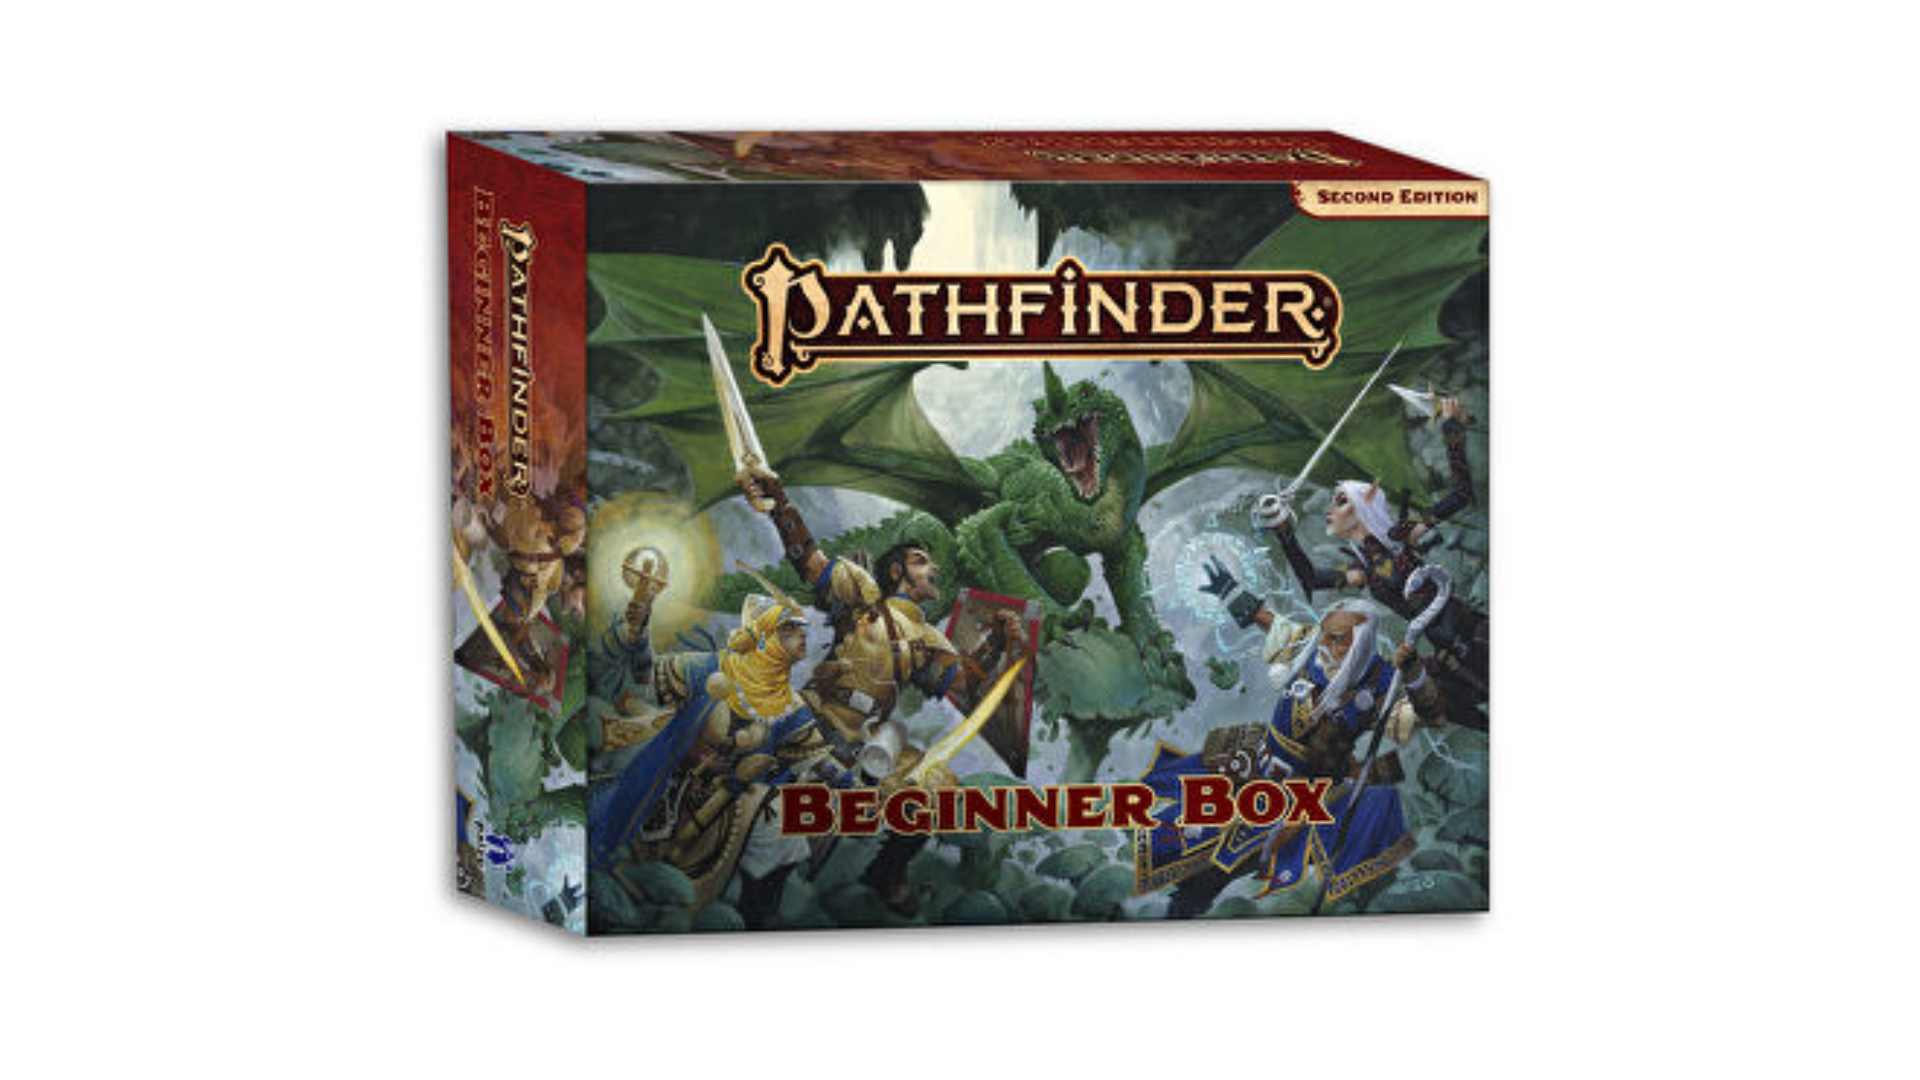 Pathfinder_Beginnerbox.jpg